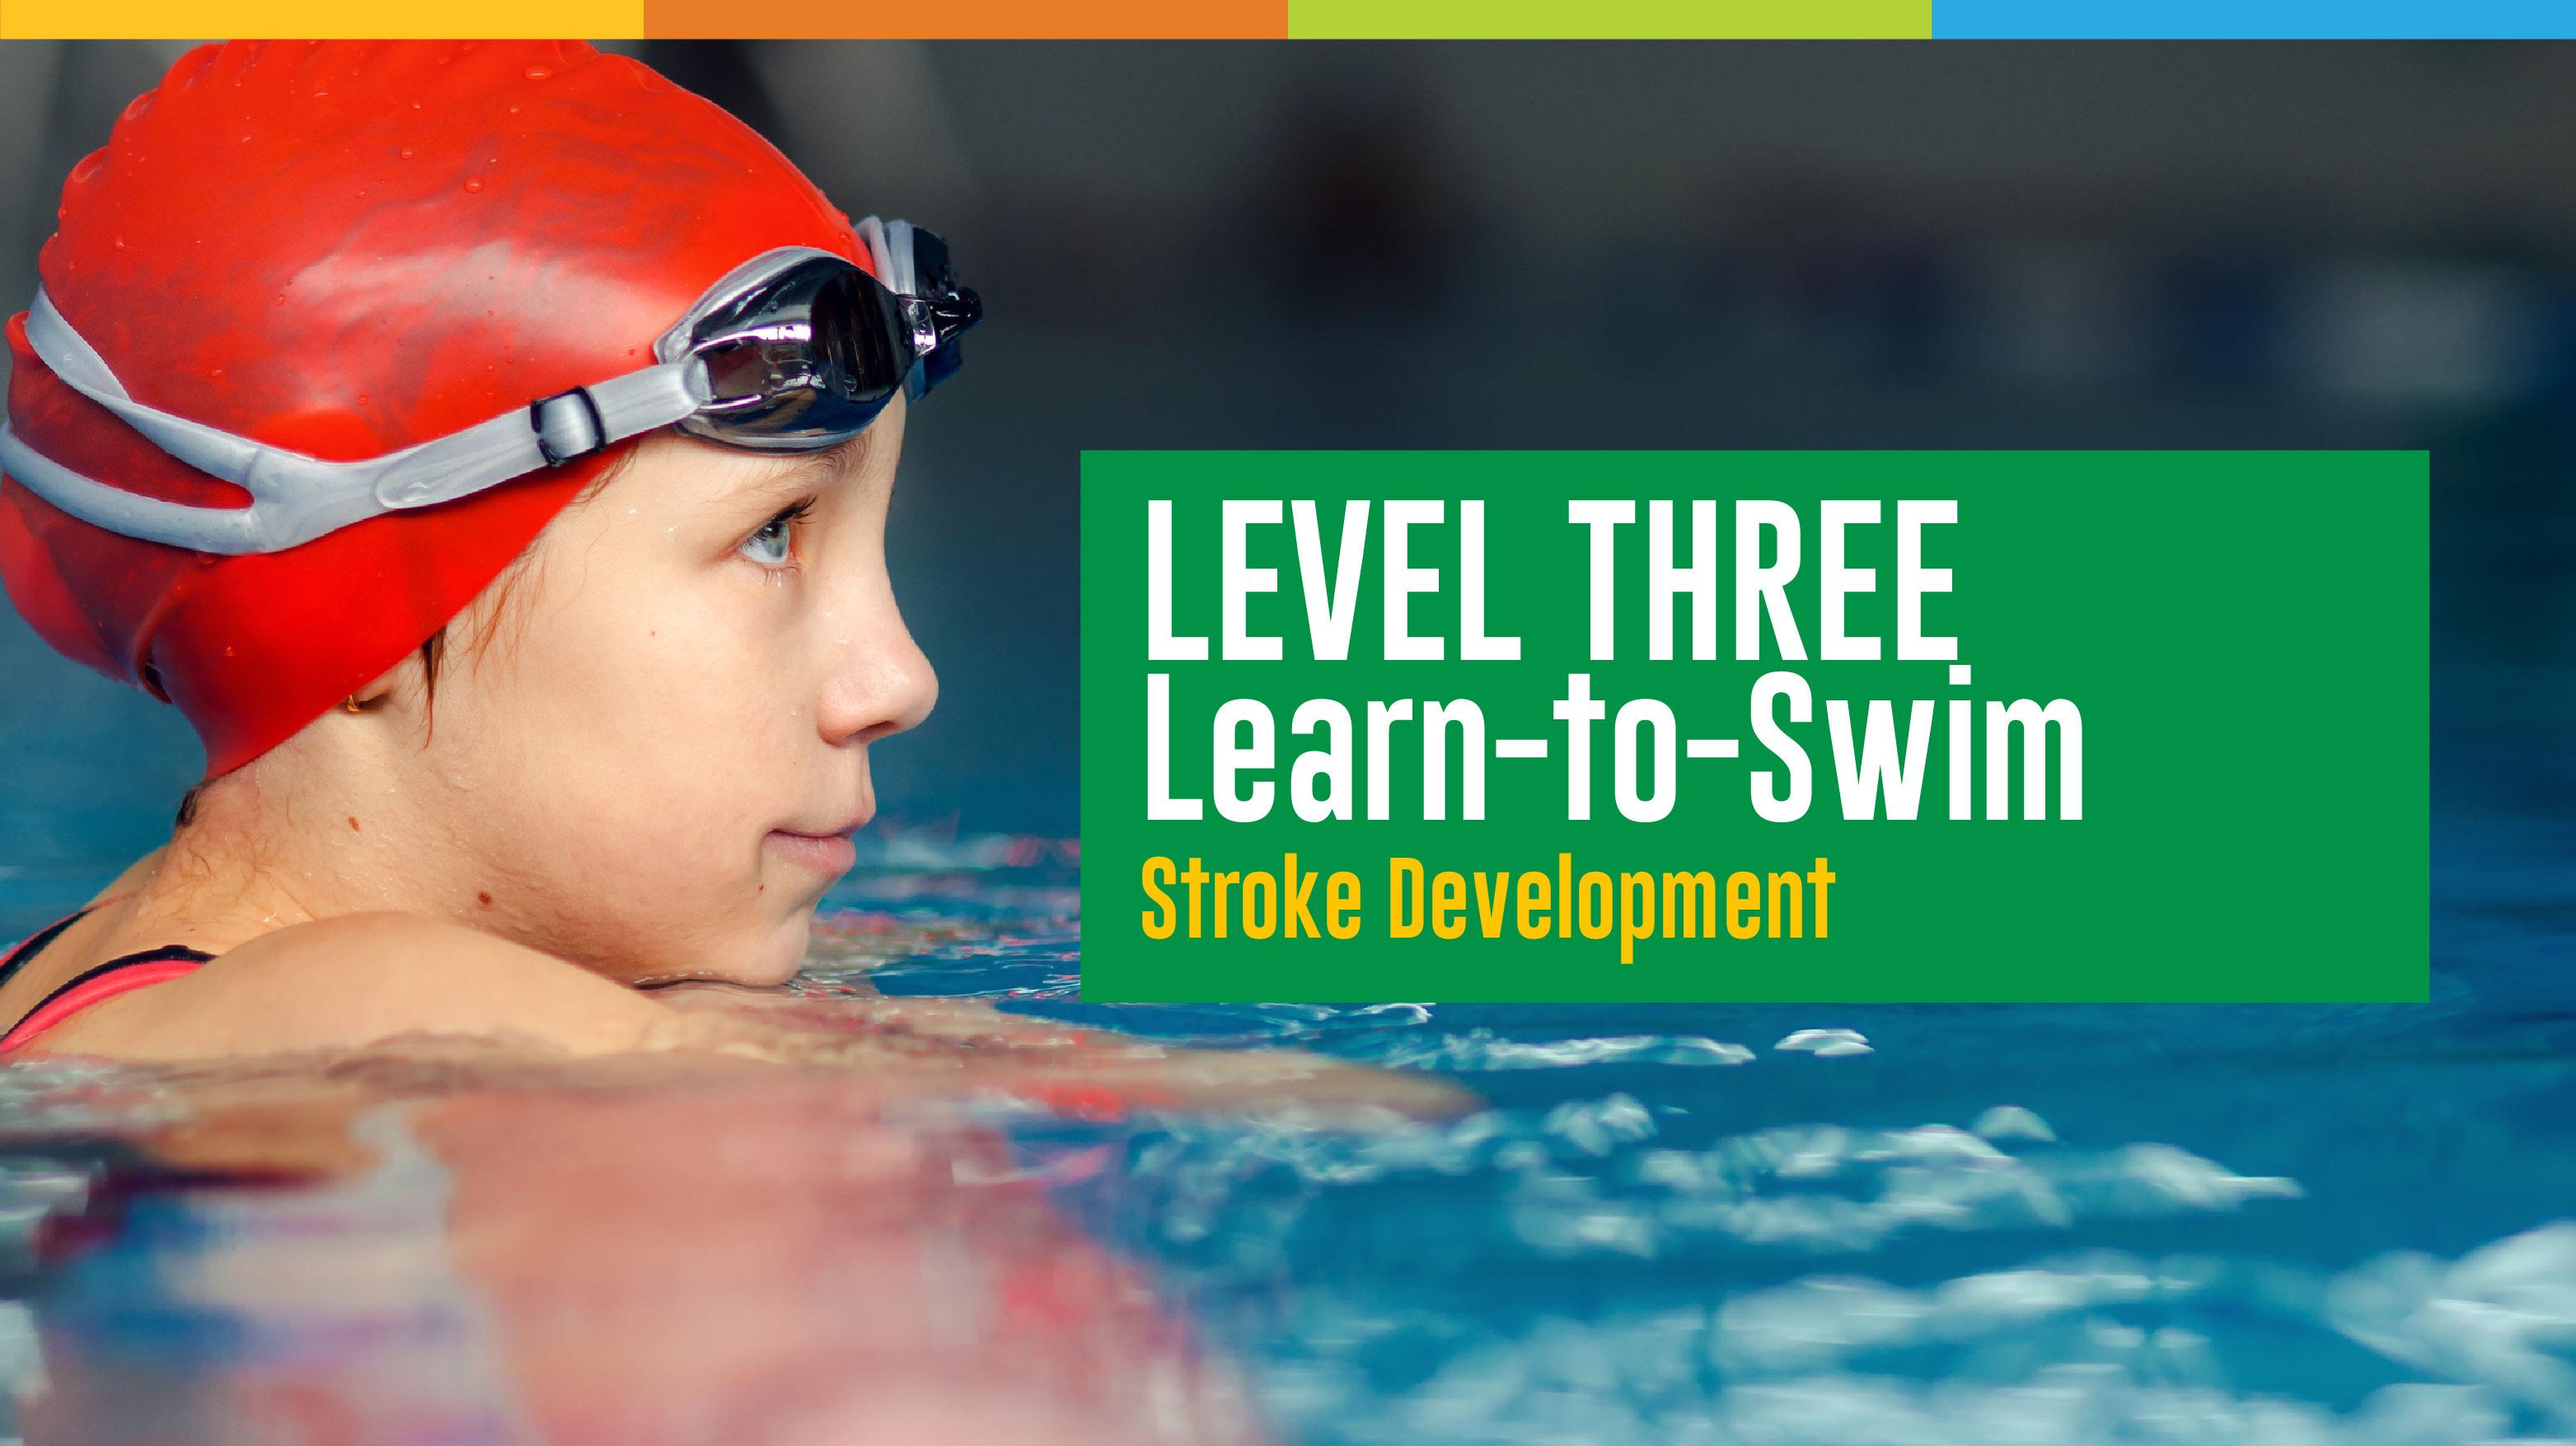 Learn to Swim - Level 3 Registration